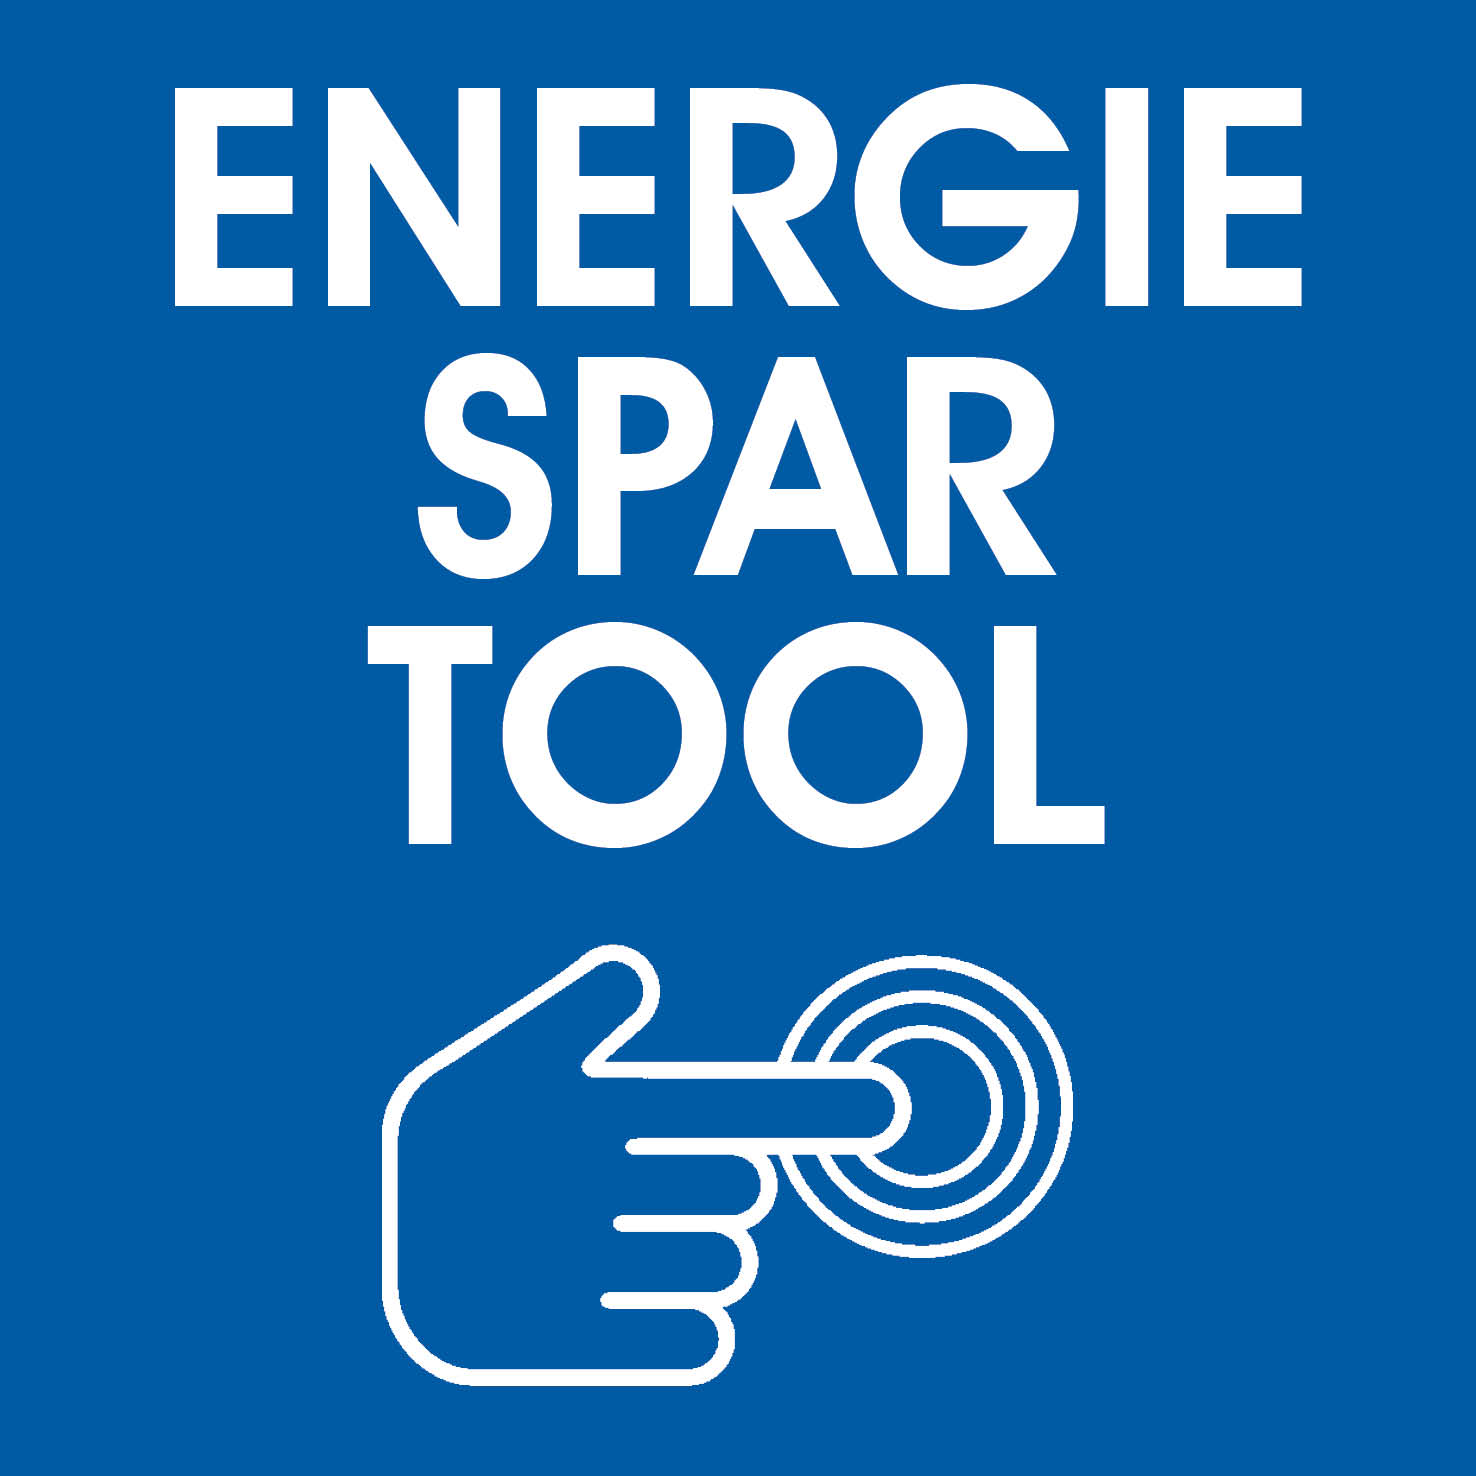 Hier geht's zum Energiespartool